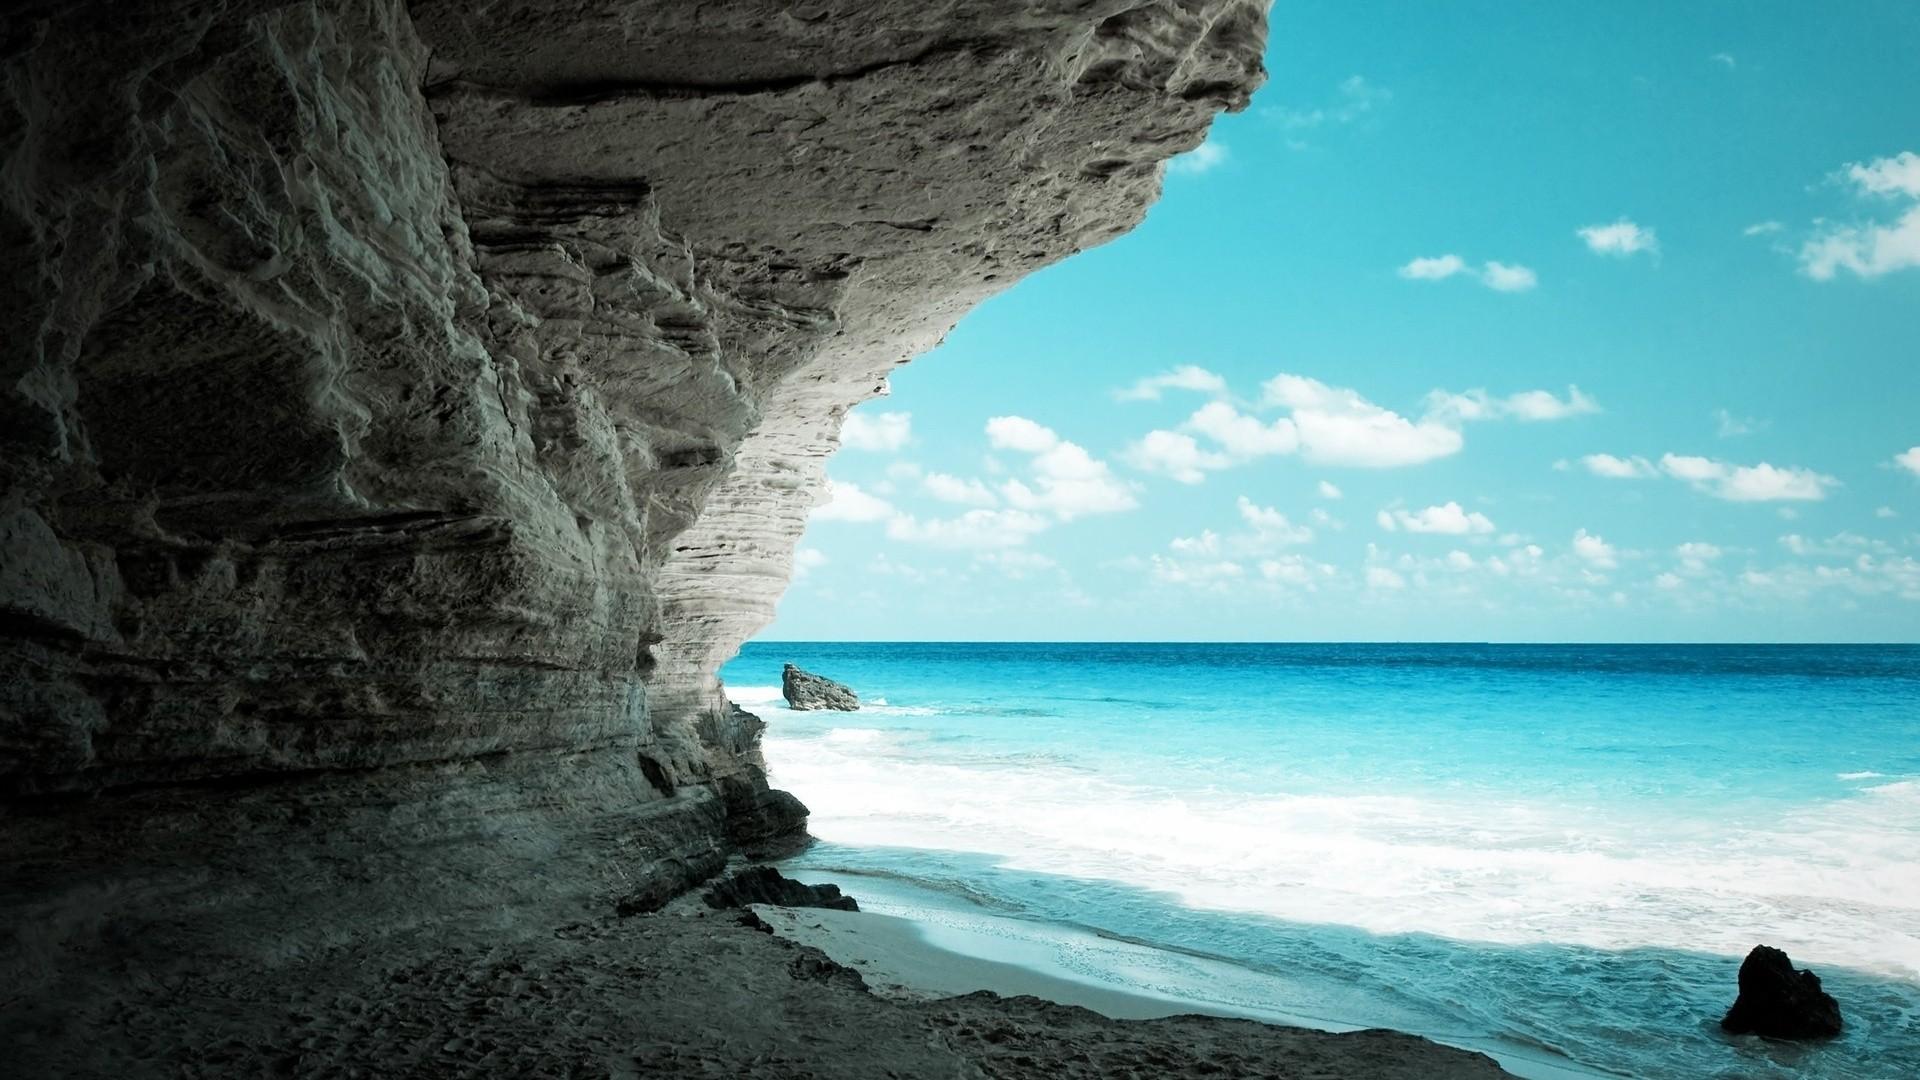 Night Beach Wallpaper Download Full